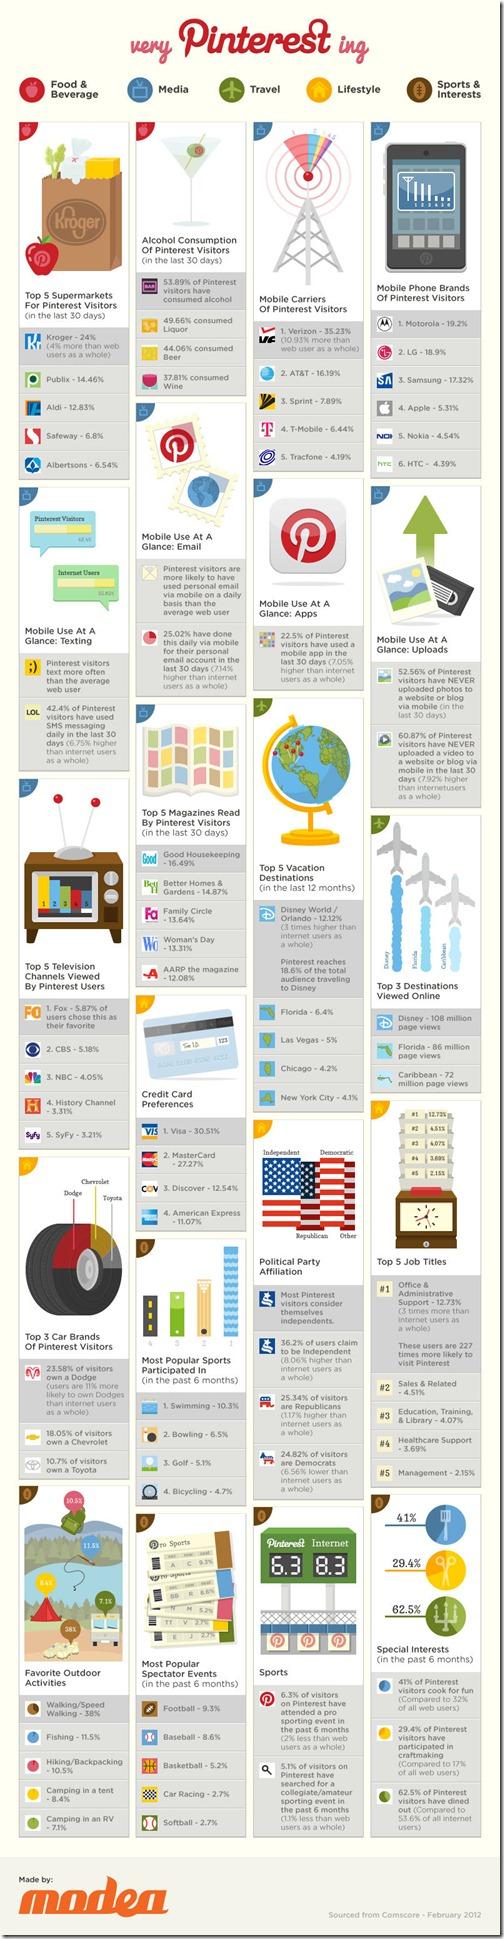 pinterest-infographic